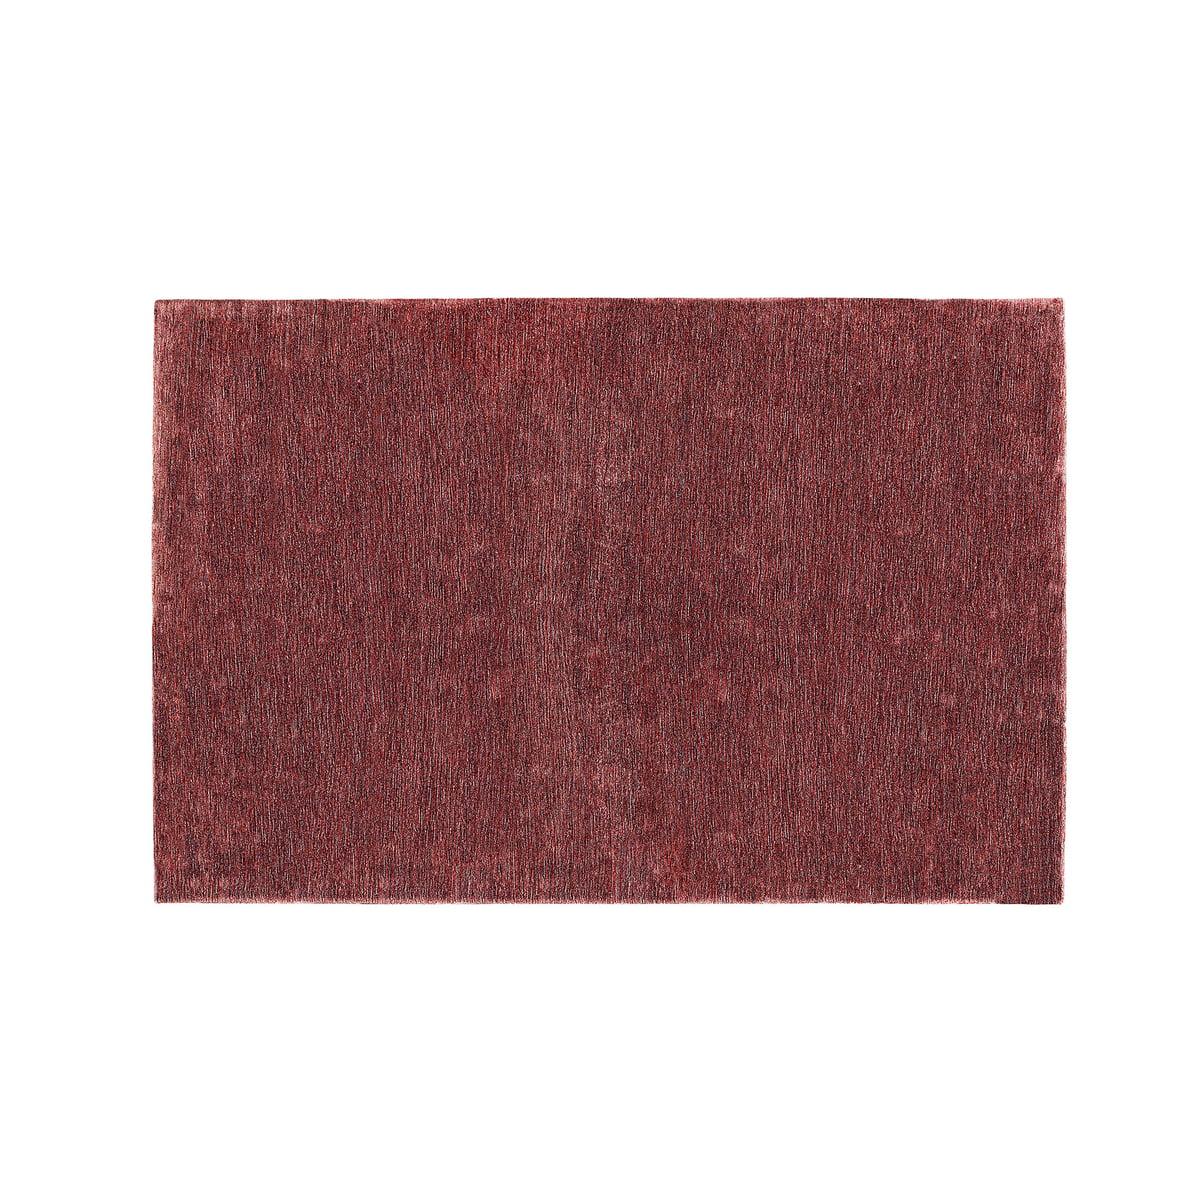 normann copenhagen confetti teppich 200 x 300 cm mehrfarbig rot rot t 200 b 300 online. Black Bedroom Furniture Sets. Home Design Ideas